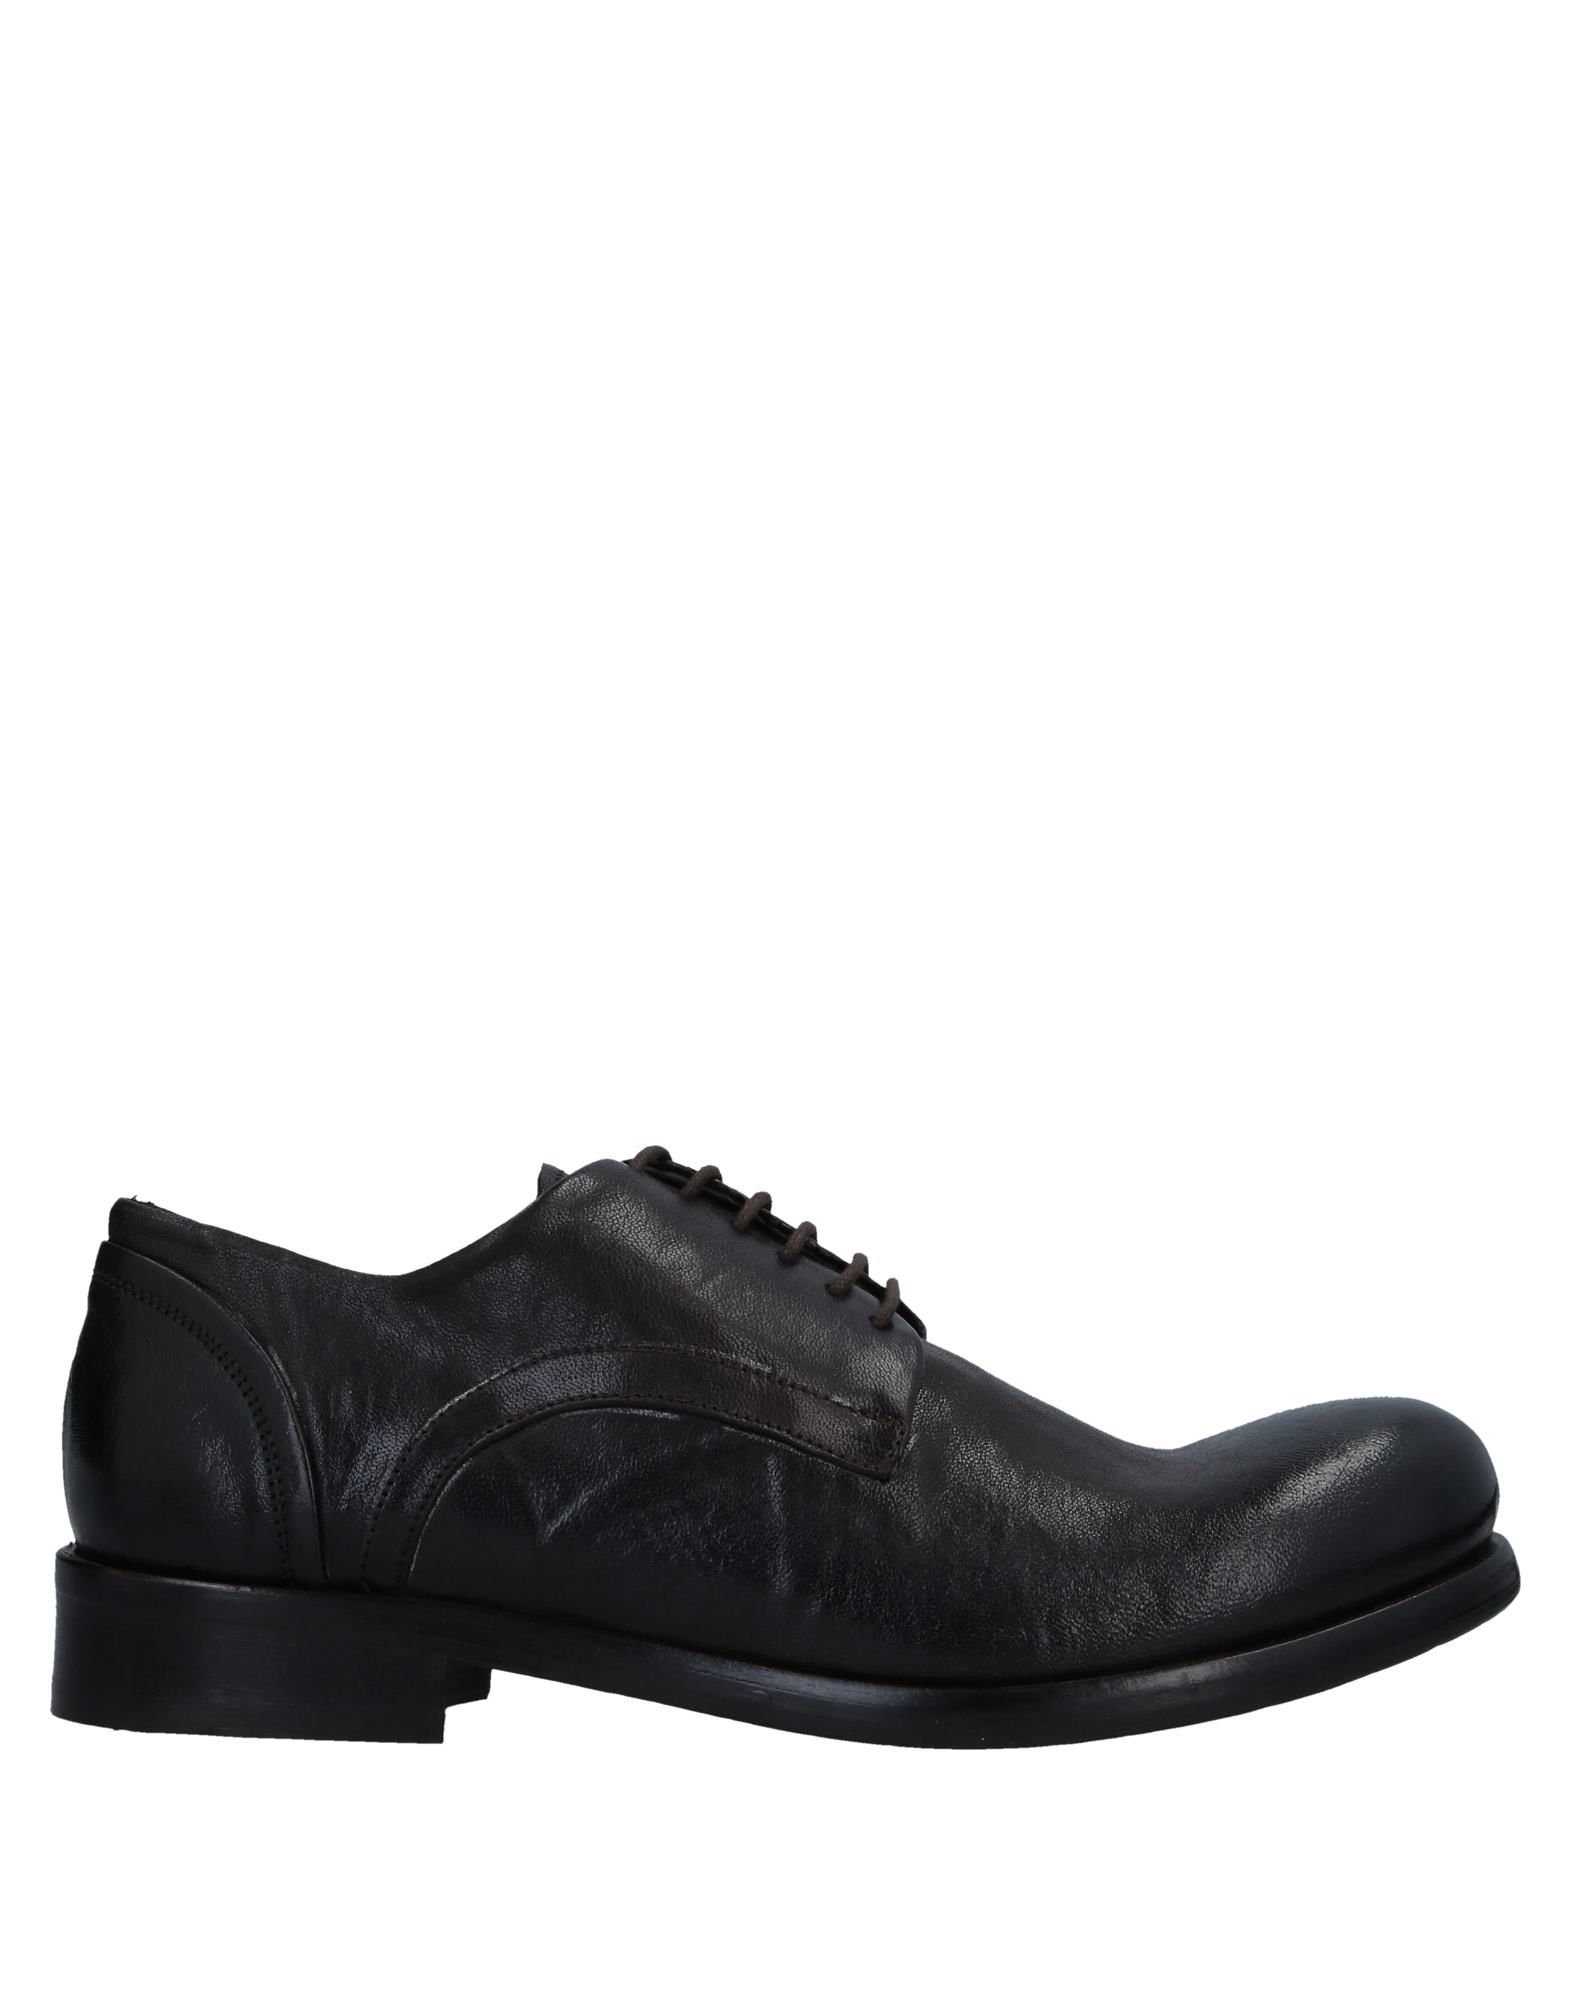 Savio Barbato Schnürschuhe Herren  11535388HJ Neue Schuhe